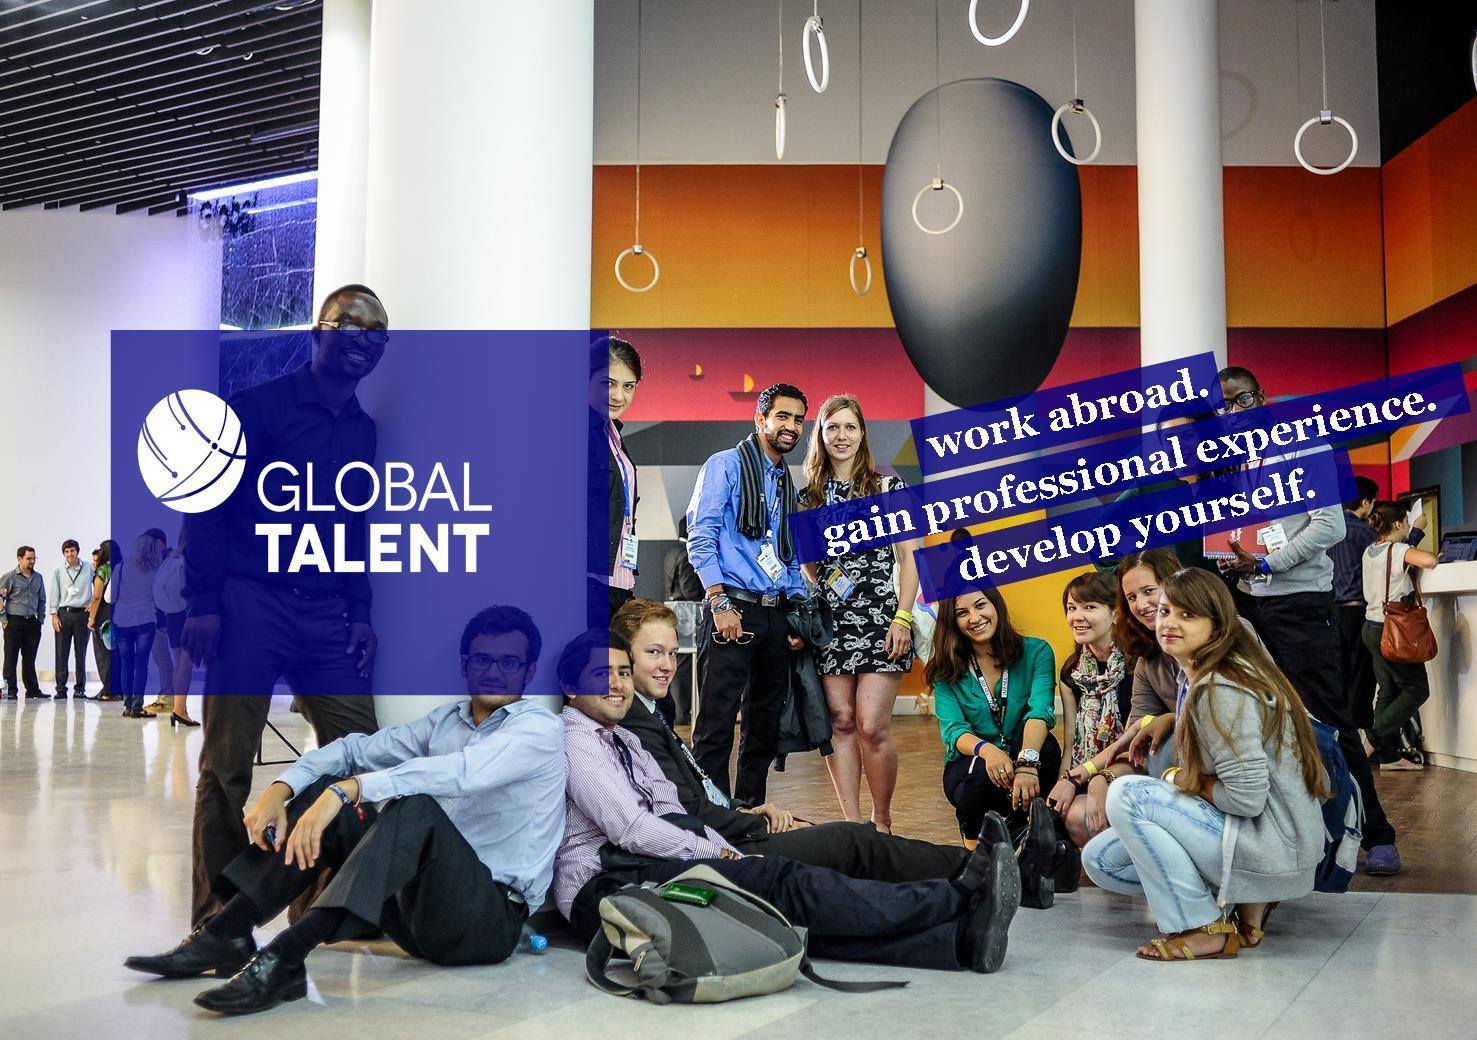 global-talent-general-slideshow